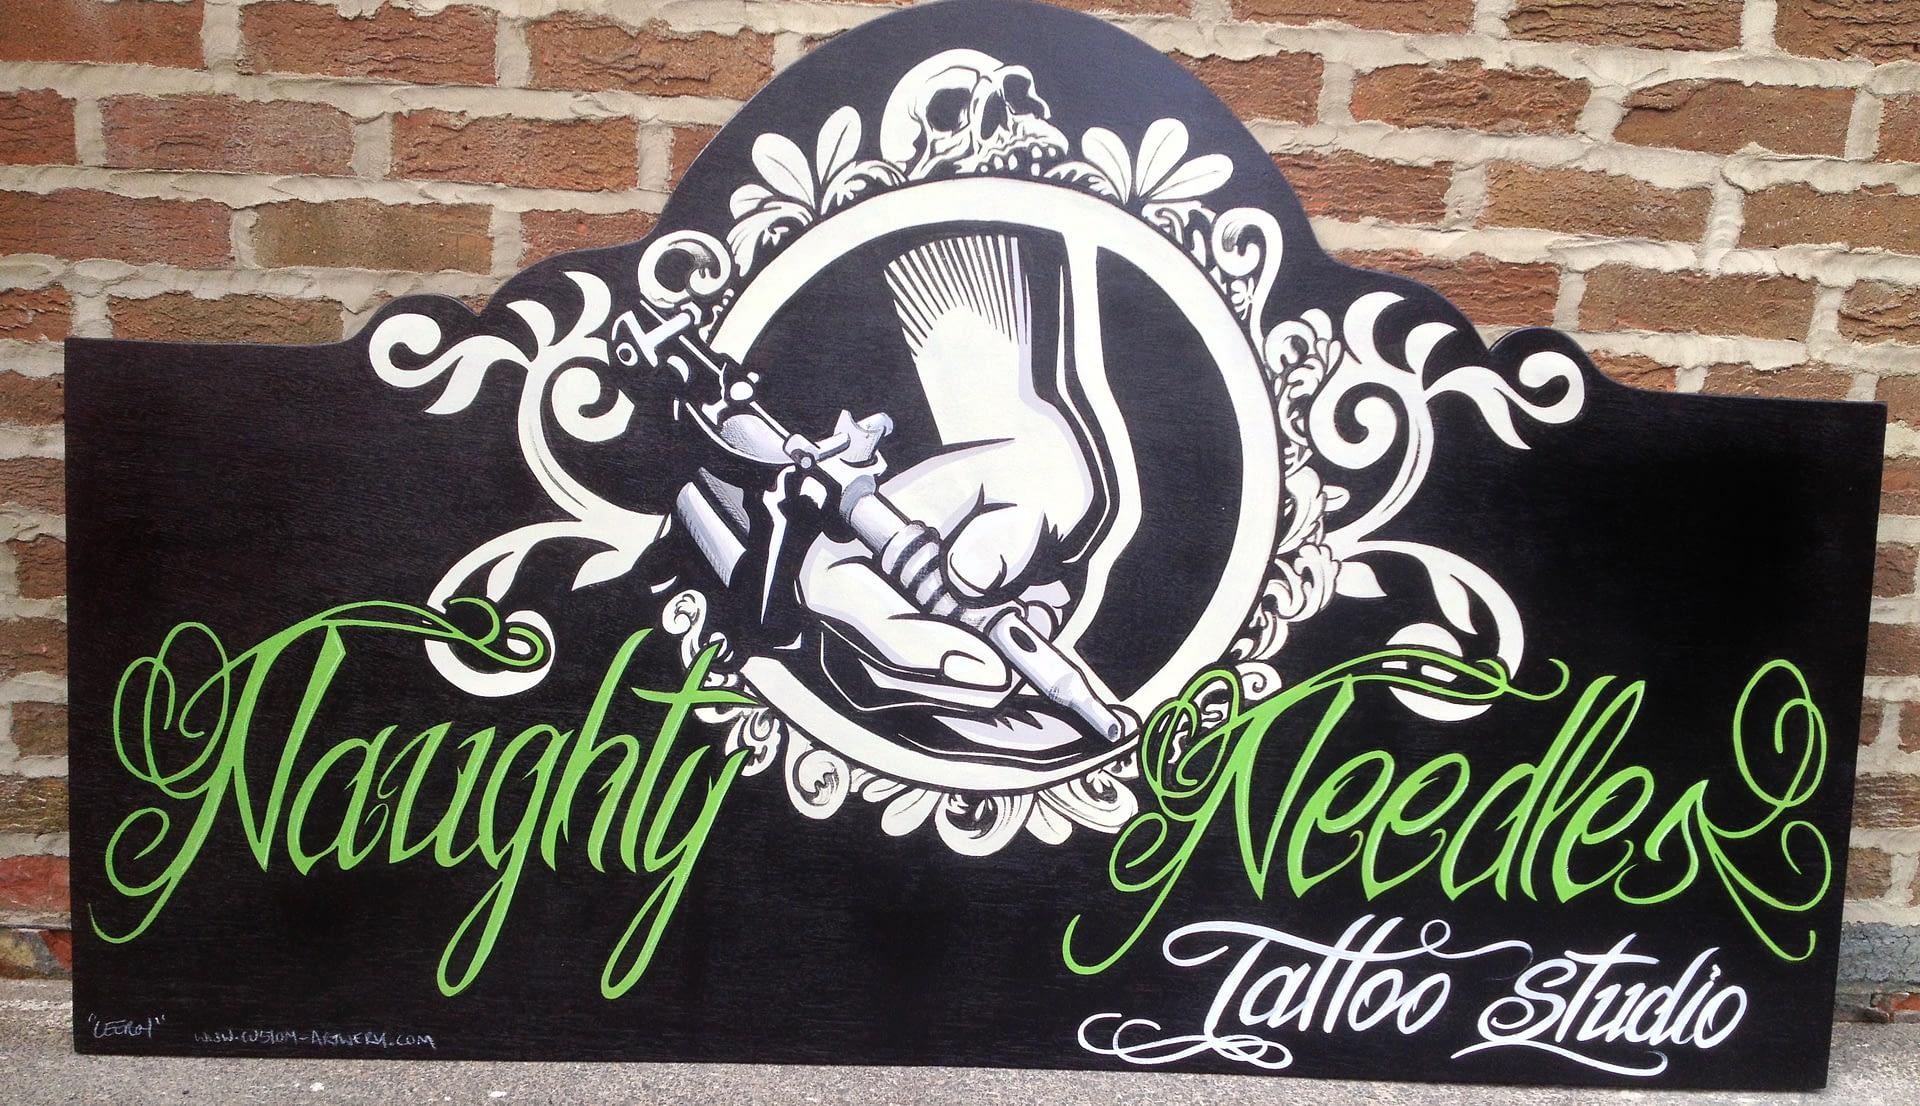 Naughty Needles Studio Sign